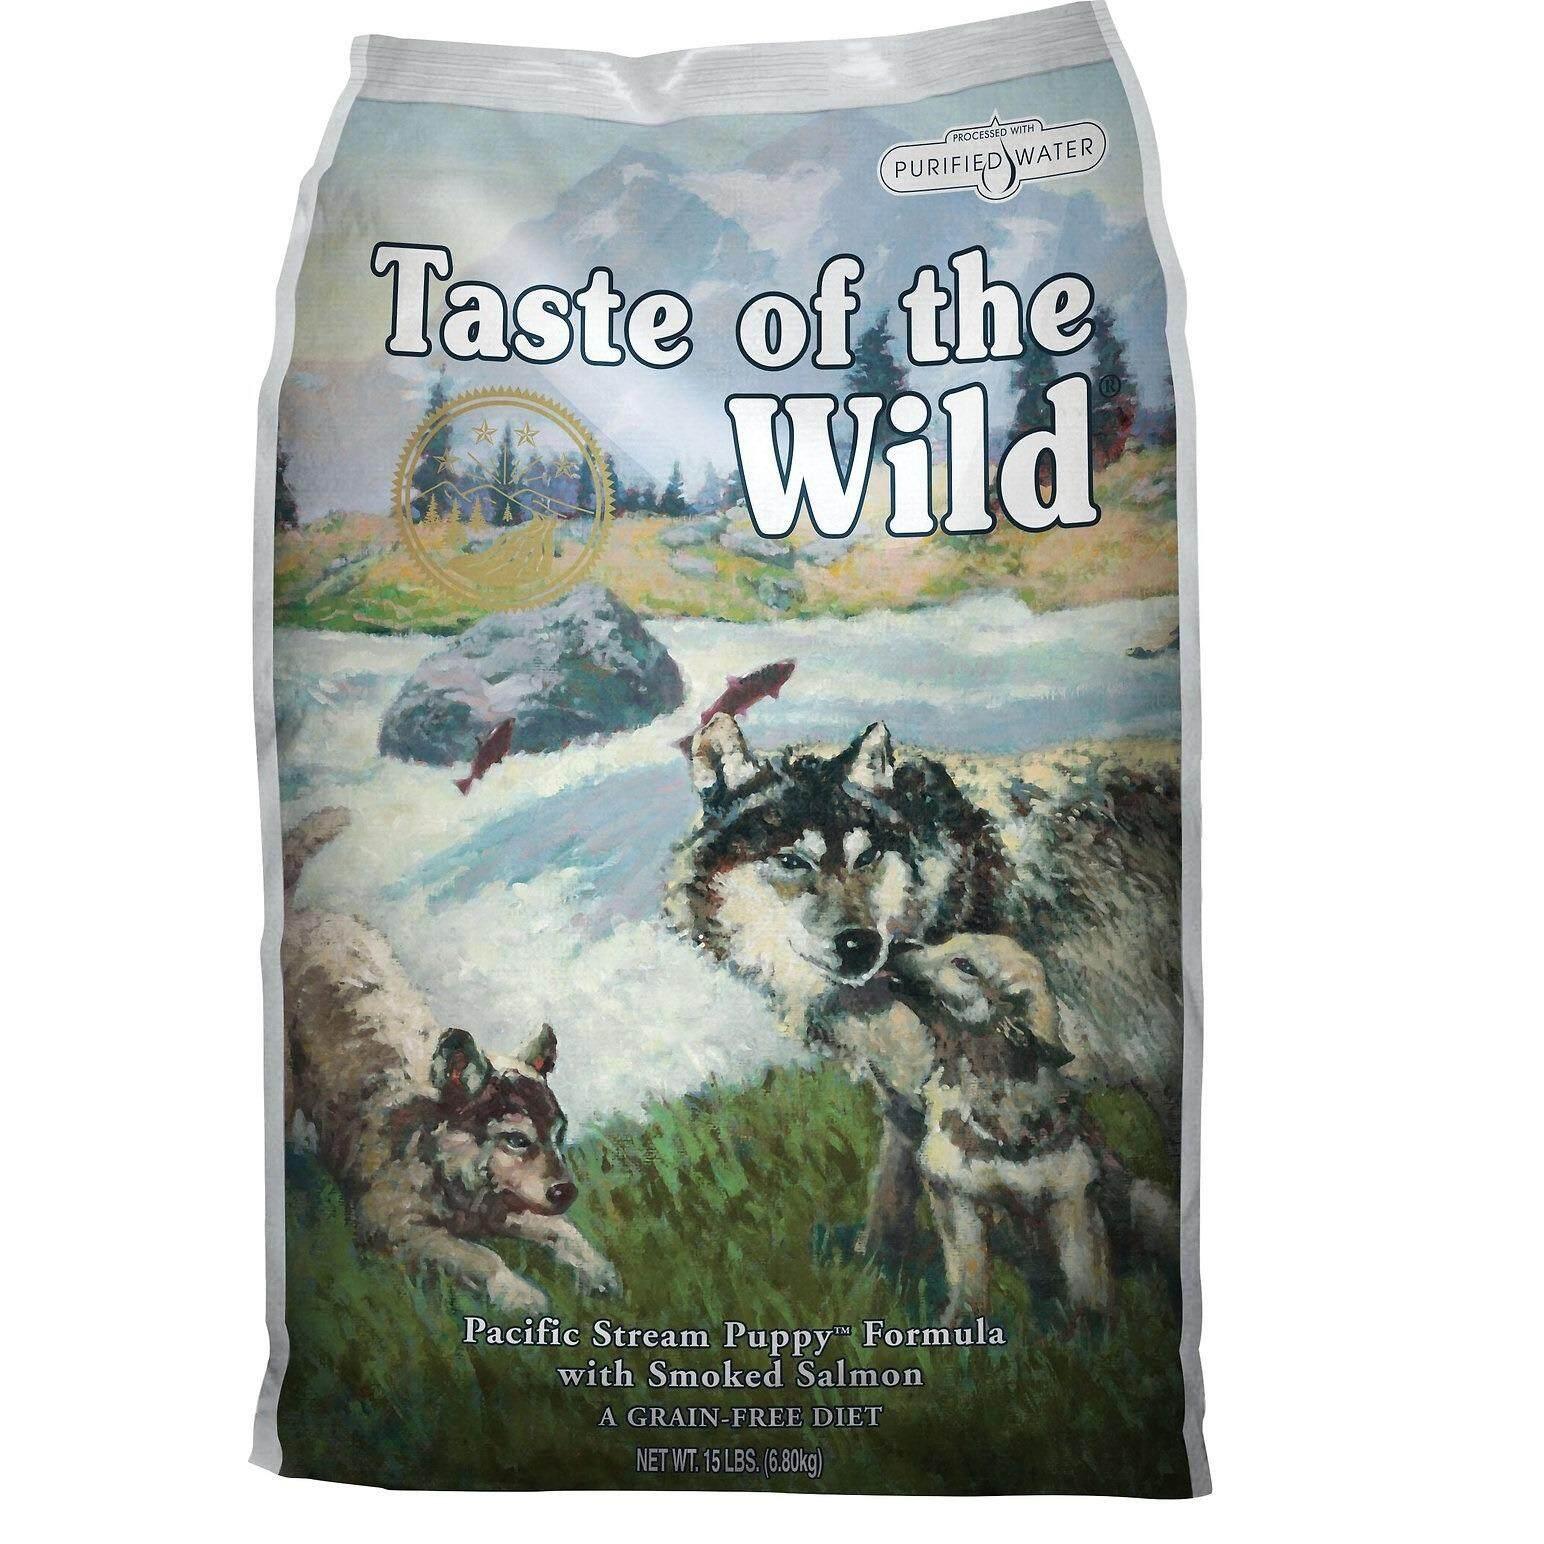 Taste Of The Wild Puppy Smoked Salmon อาหารลูกสุนัข ทำจากแซลมอน 1 5Lb หรือ 680G Thailand